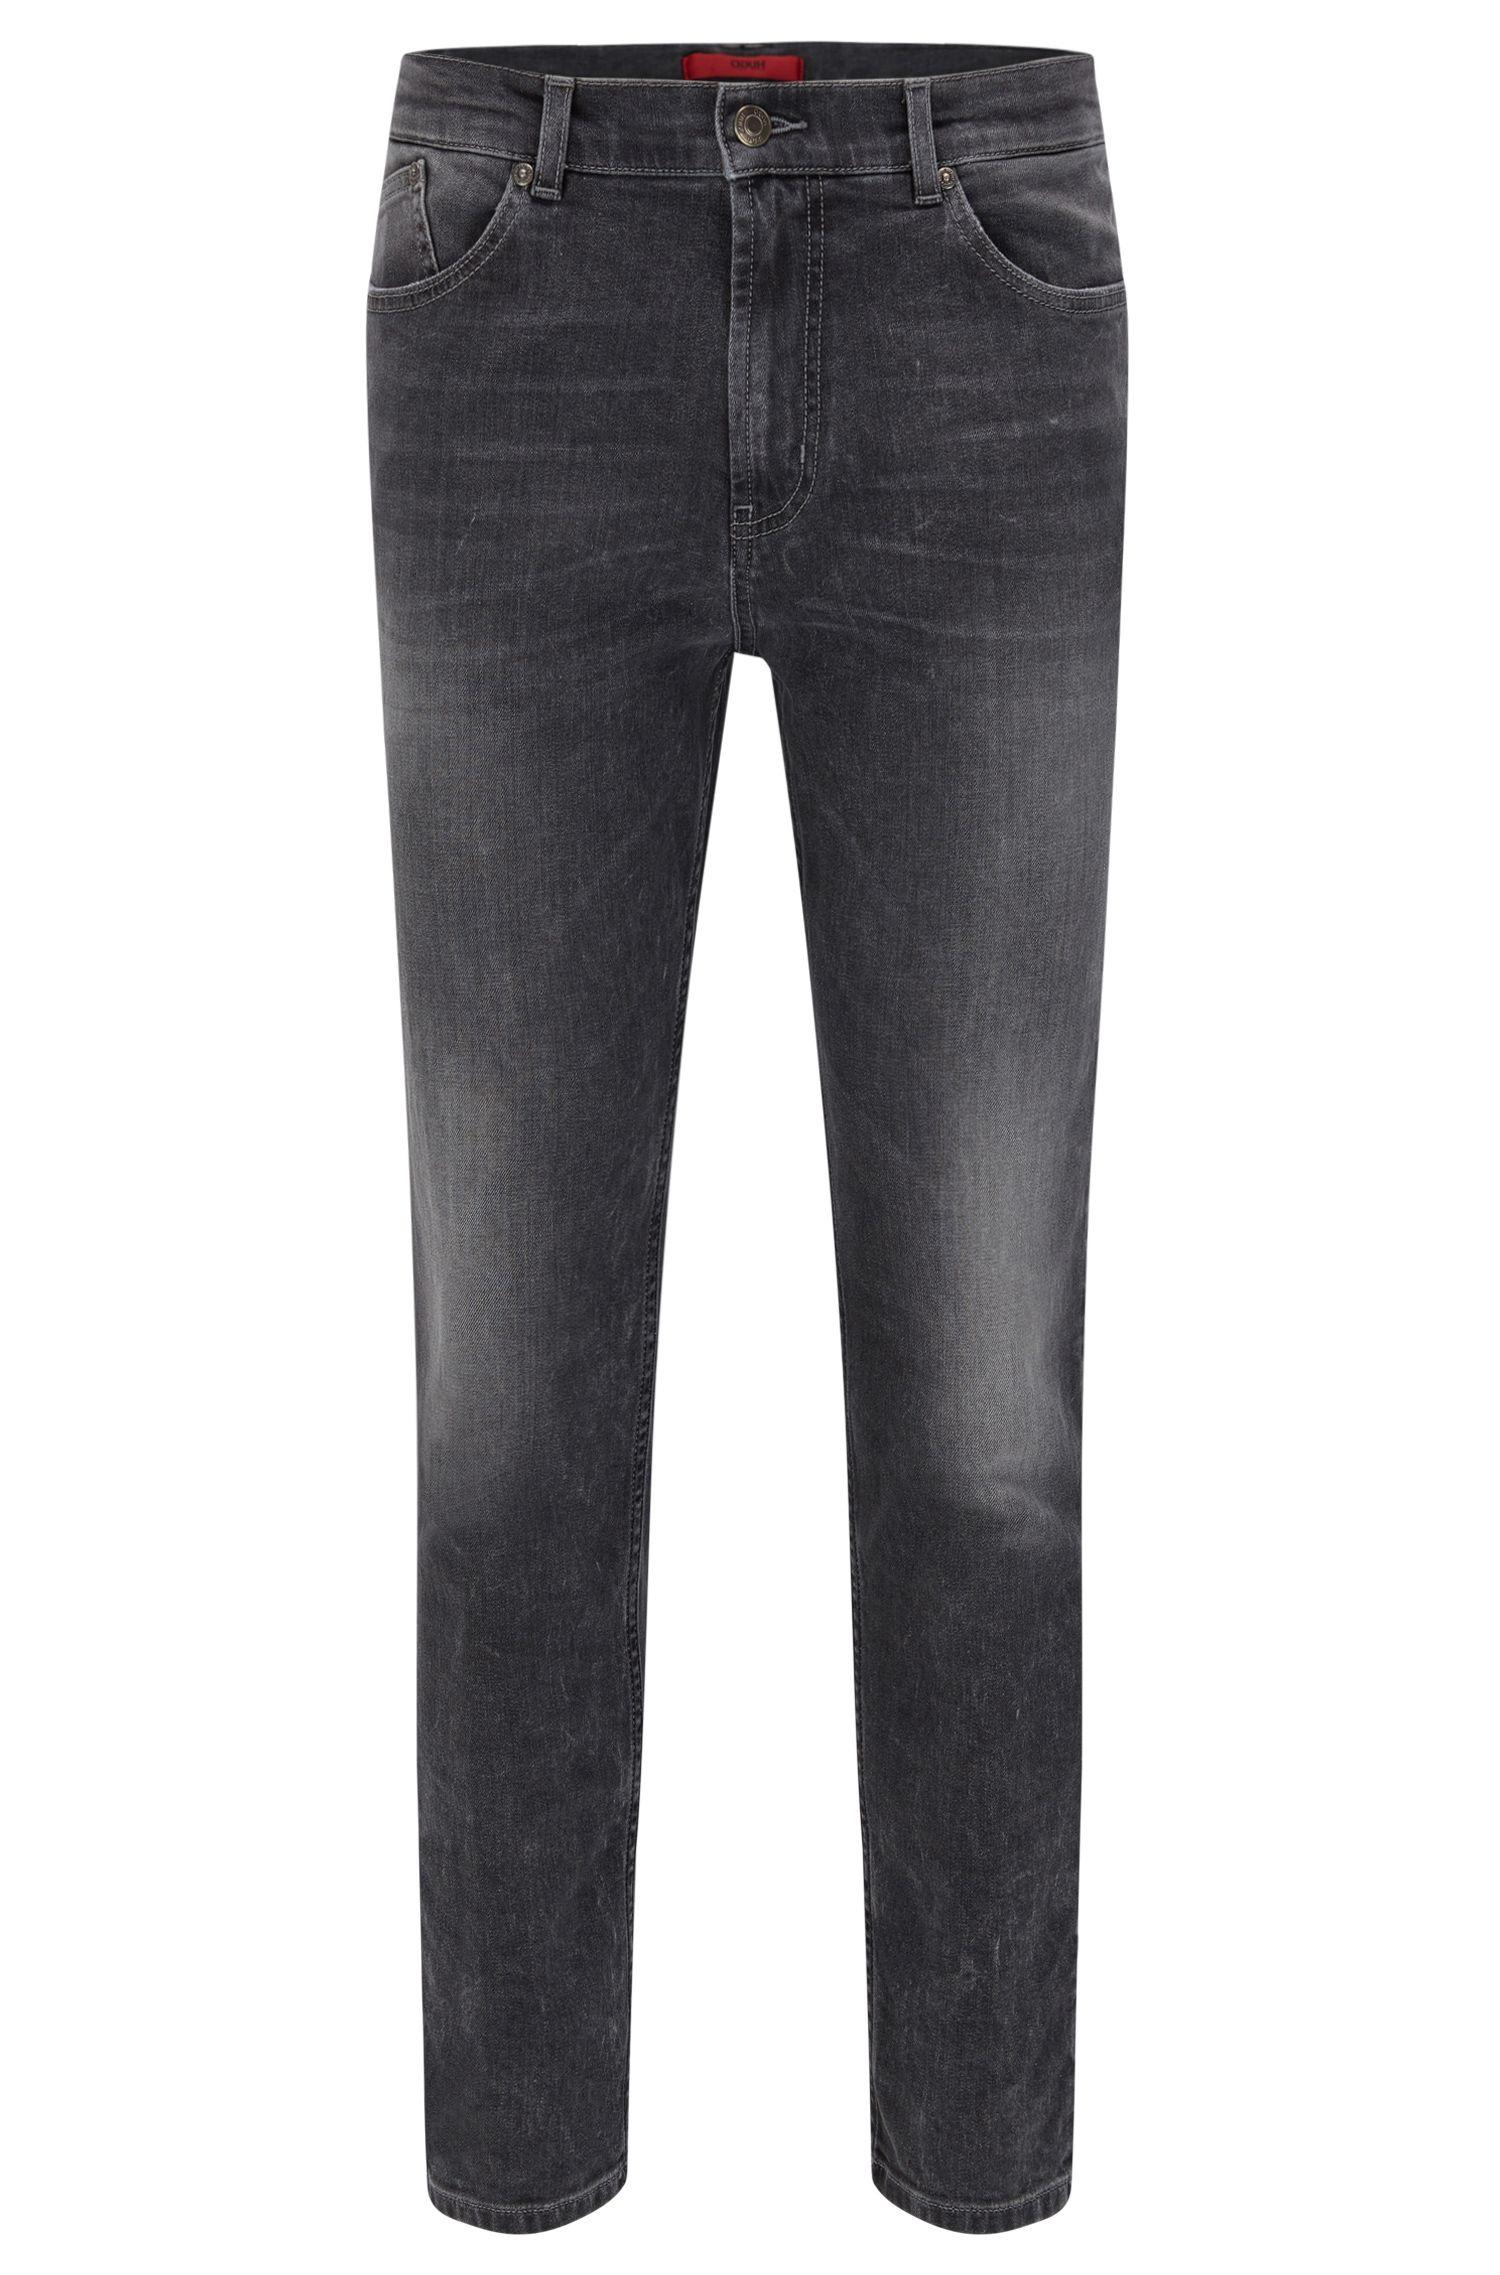 9.5 oz Stretch Cotton Jeans, Slim Fit | Hugo 332